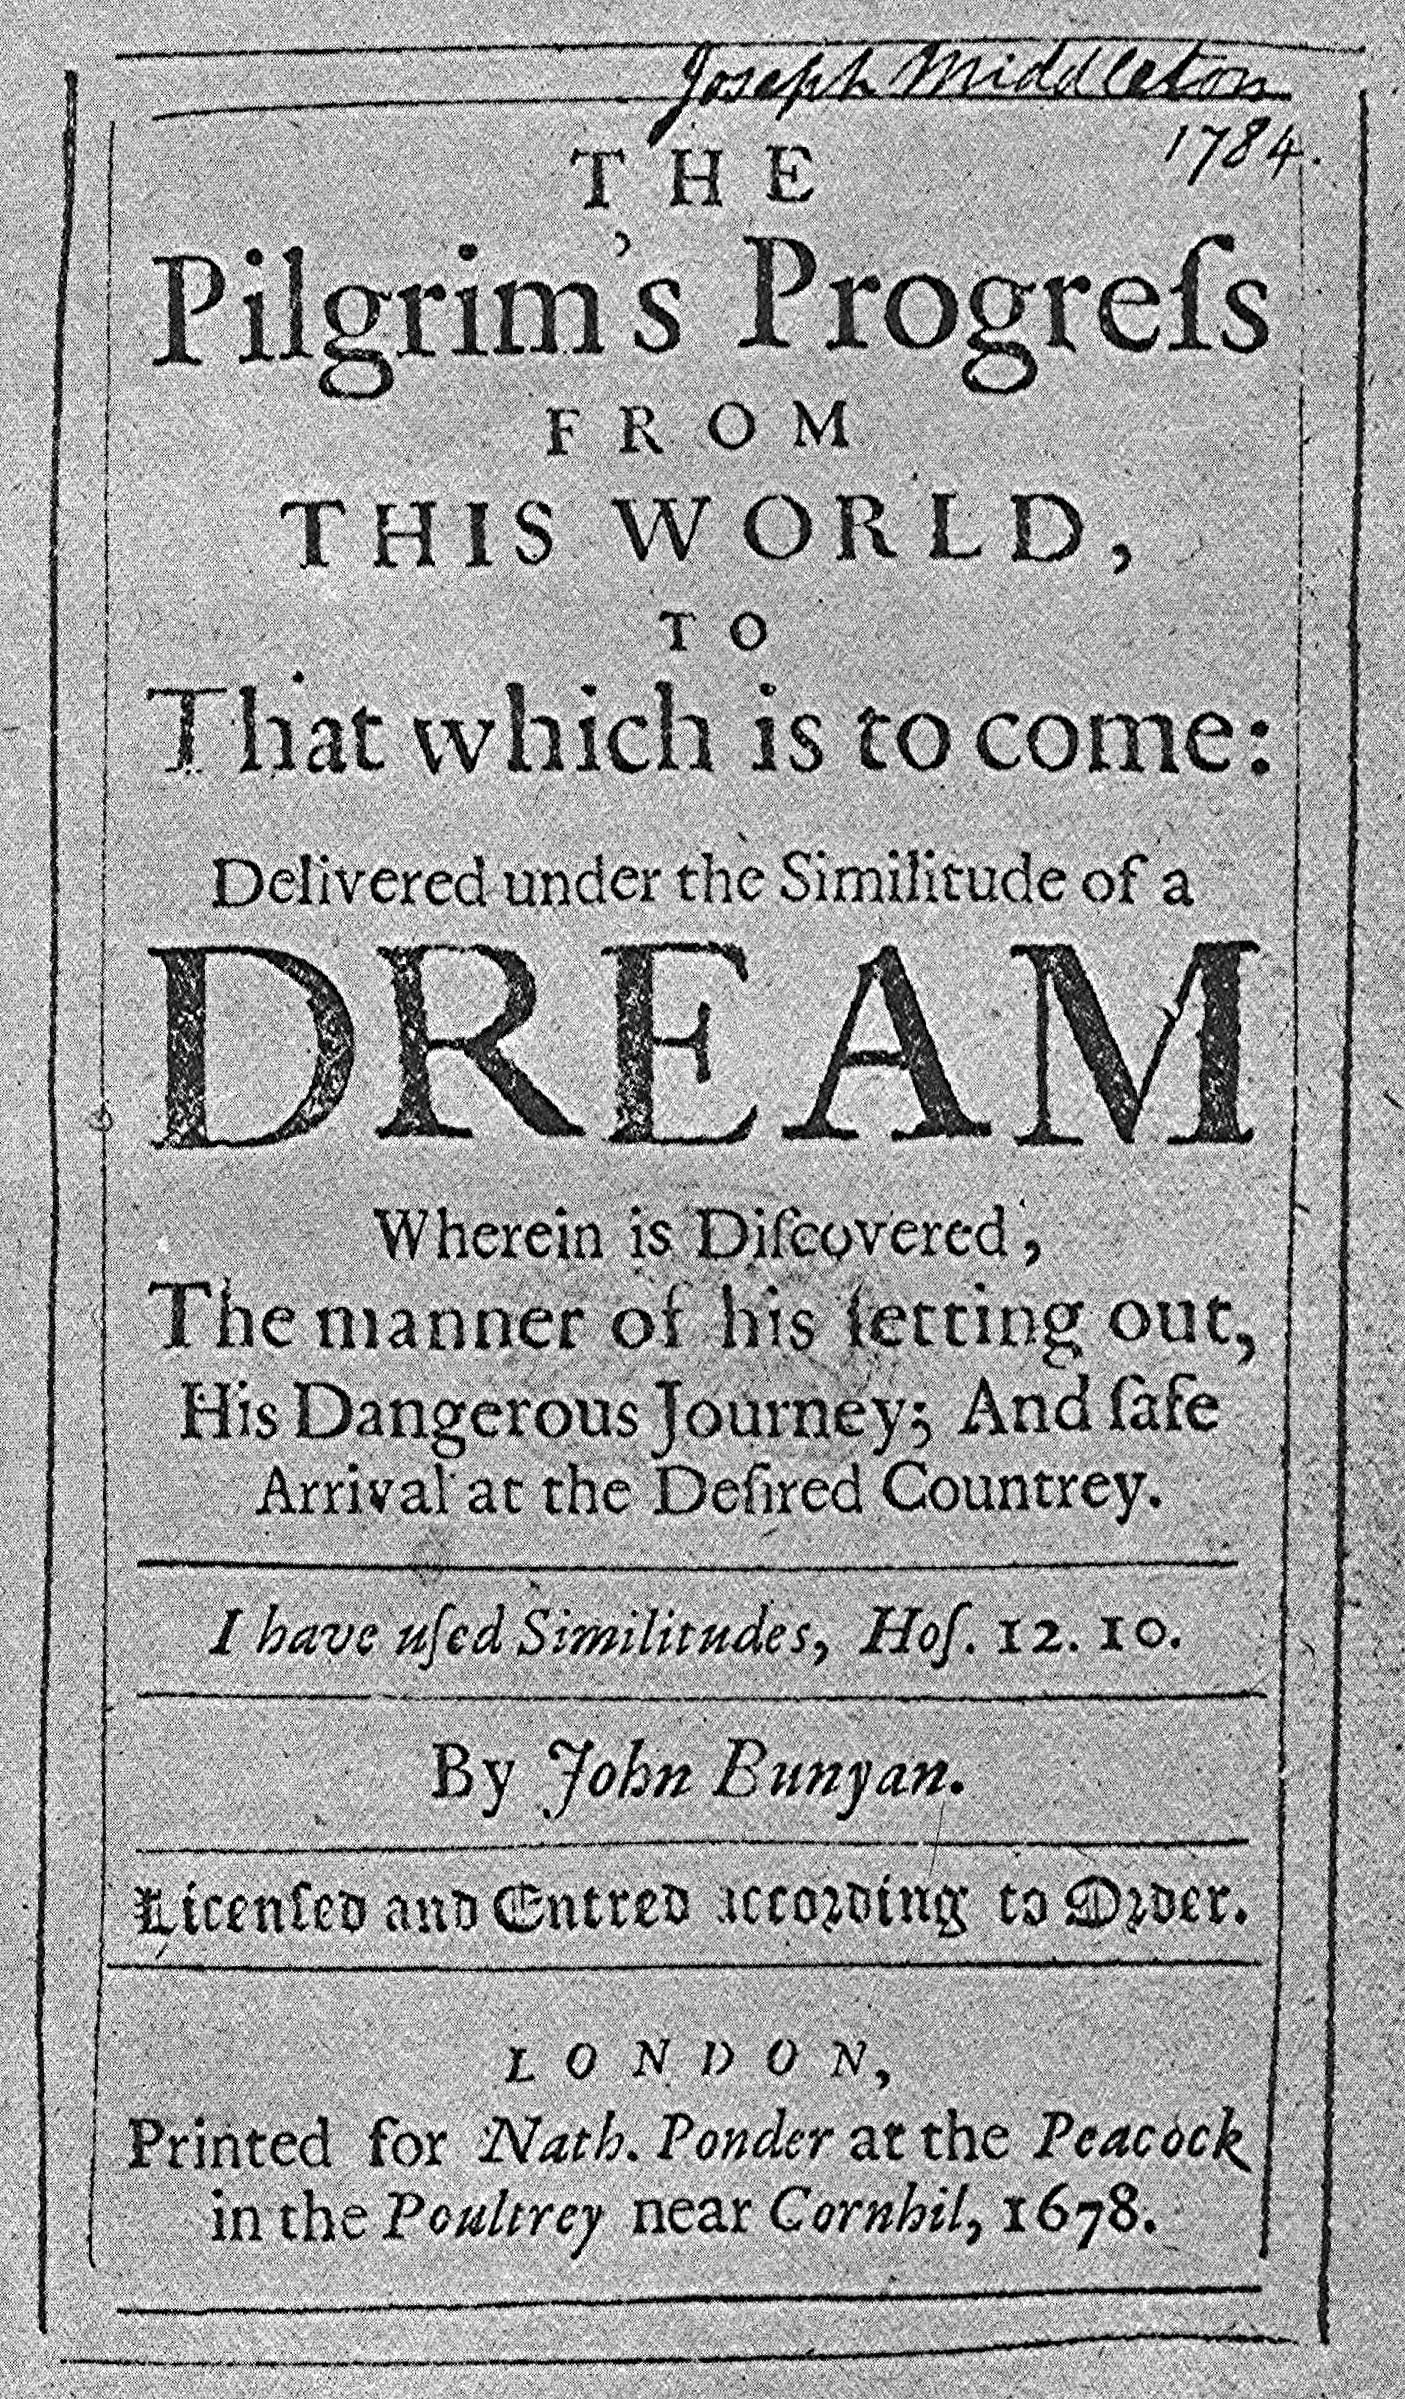 The Pilgrim's Progress - Wikipedia